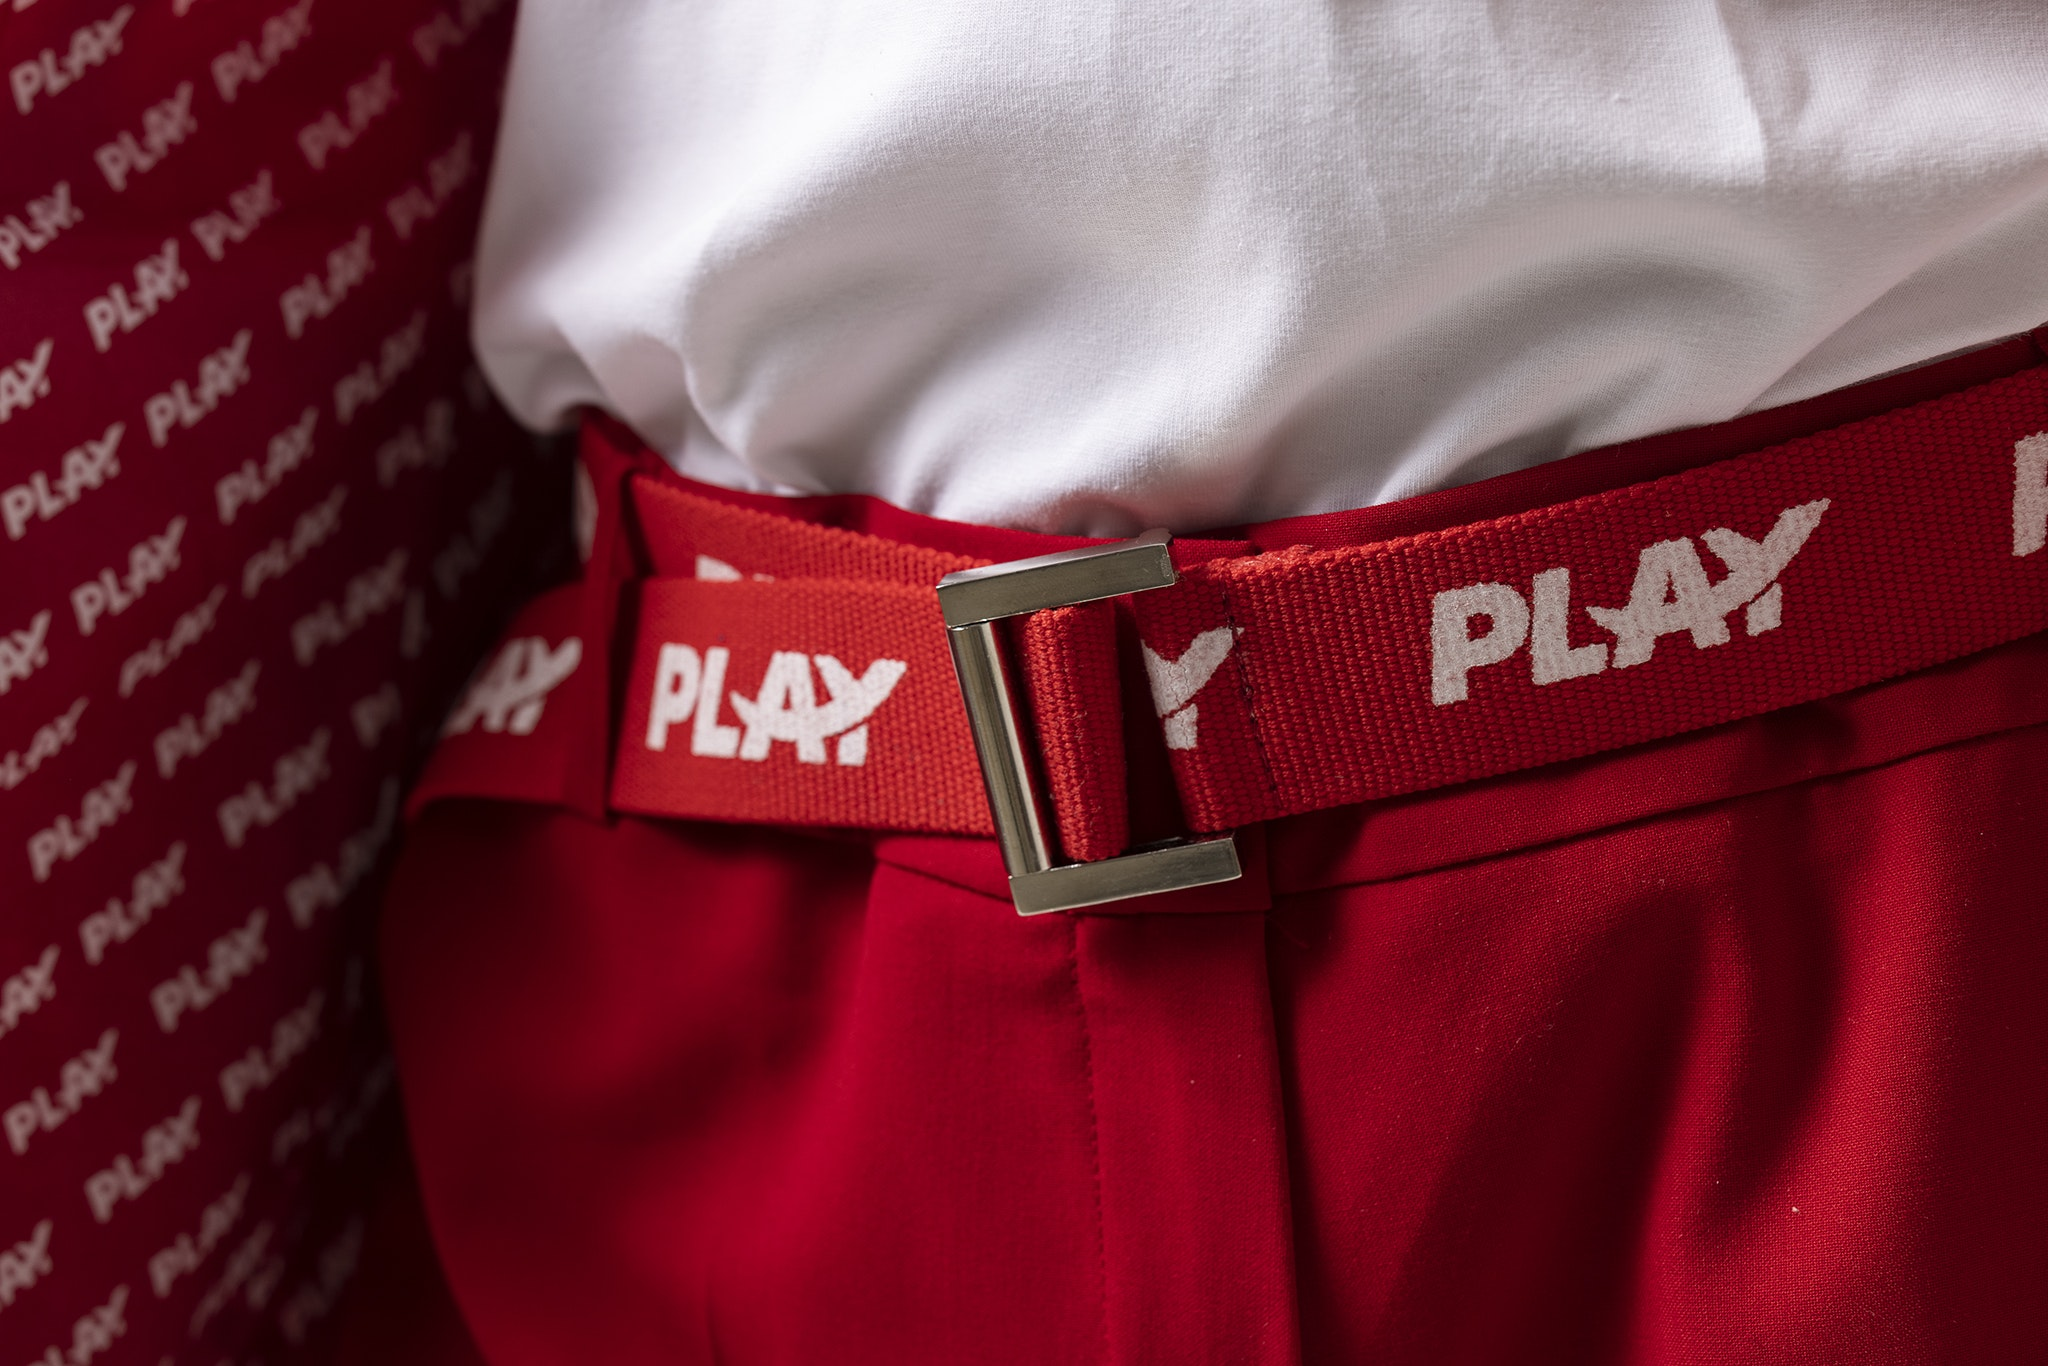 PLAY crew uniforms